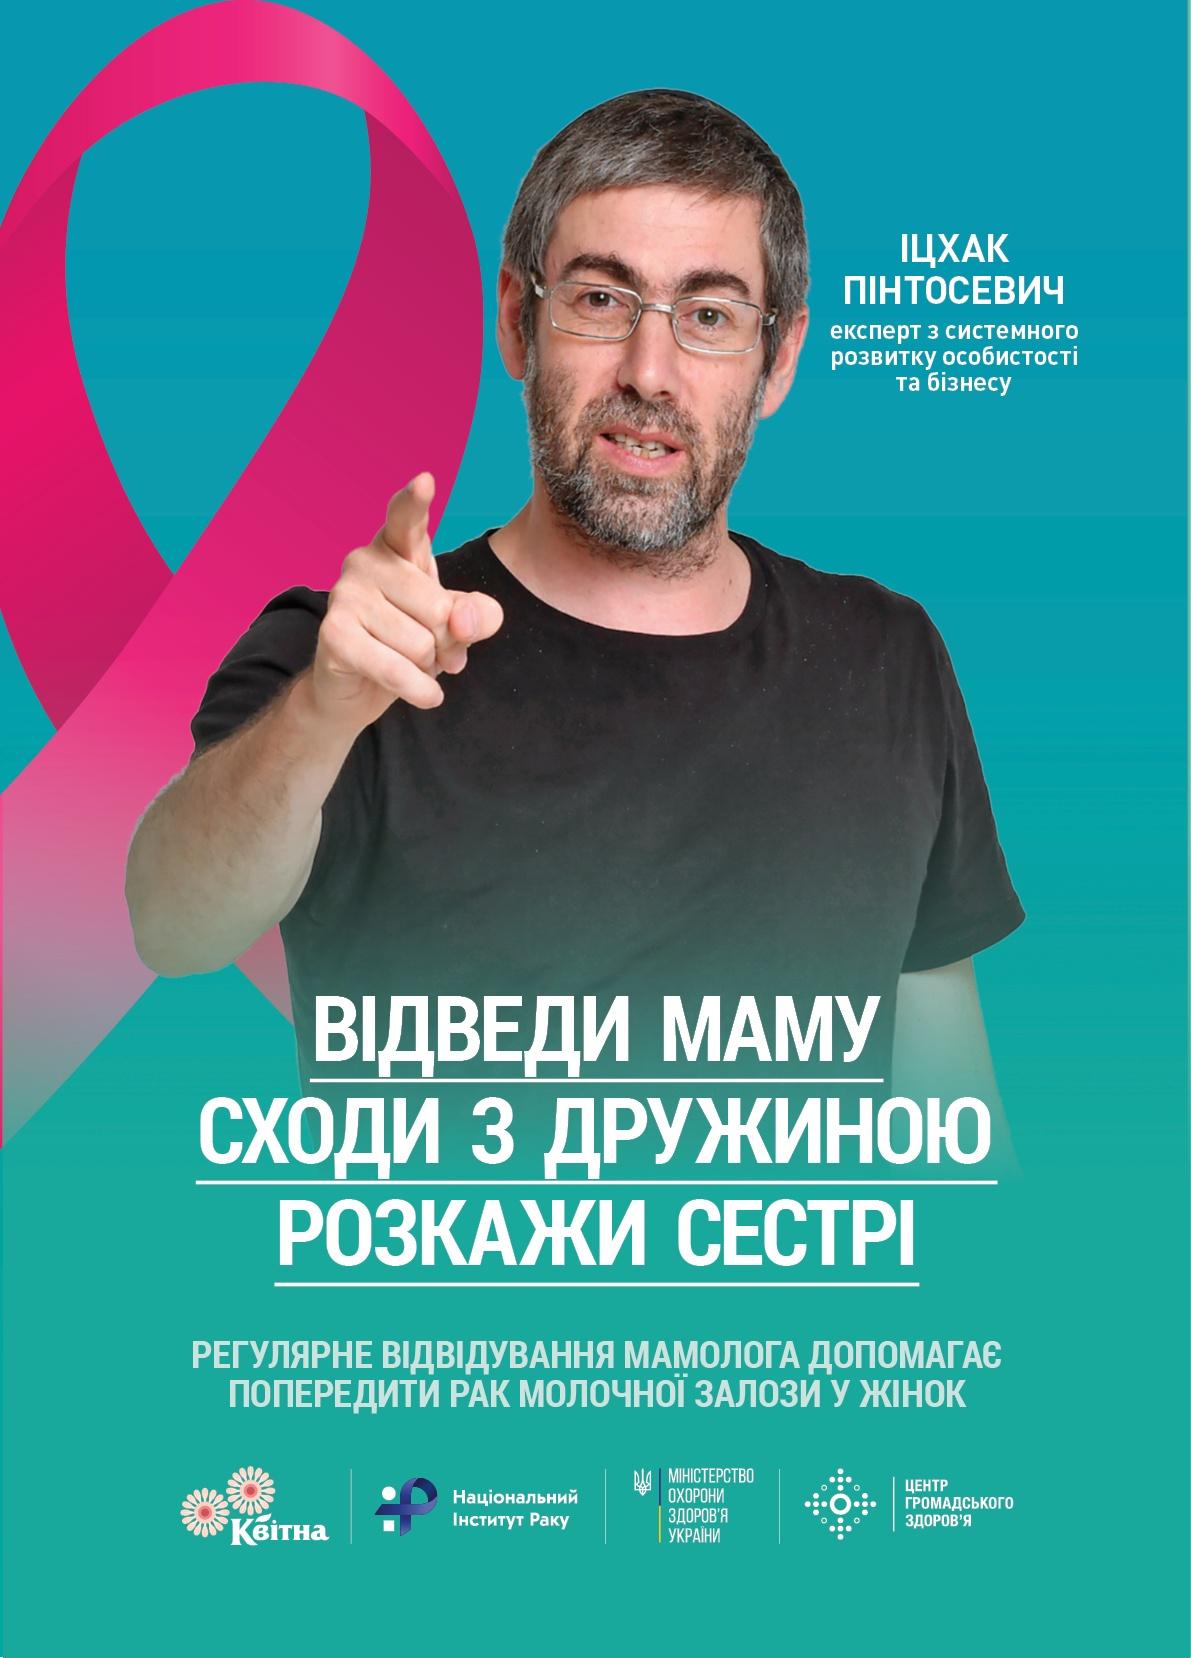 metrolight_420x585_pentosevych-1